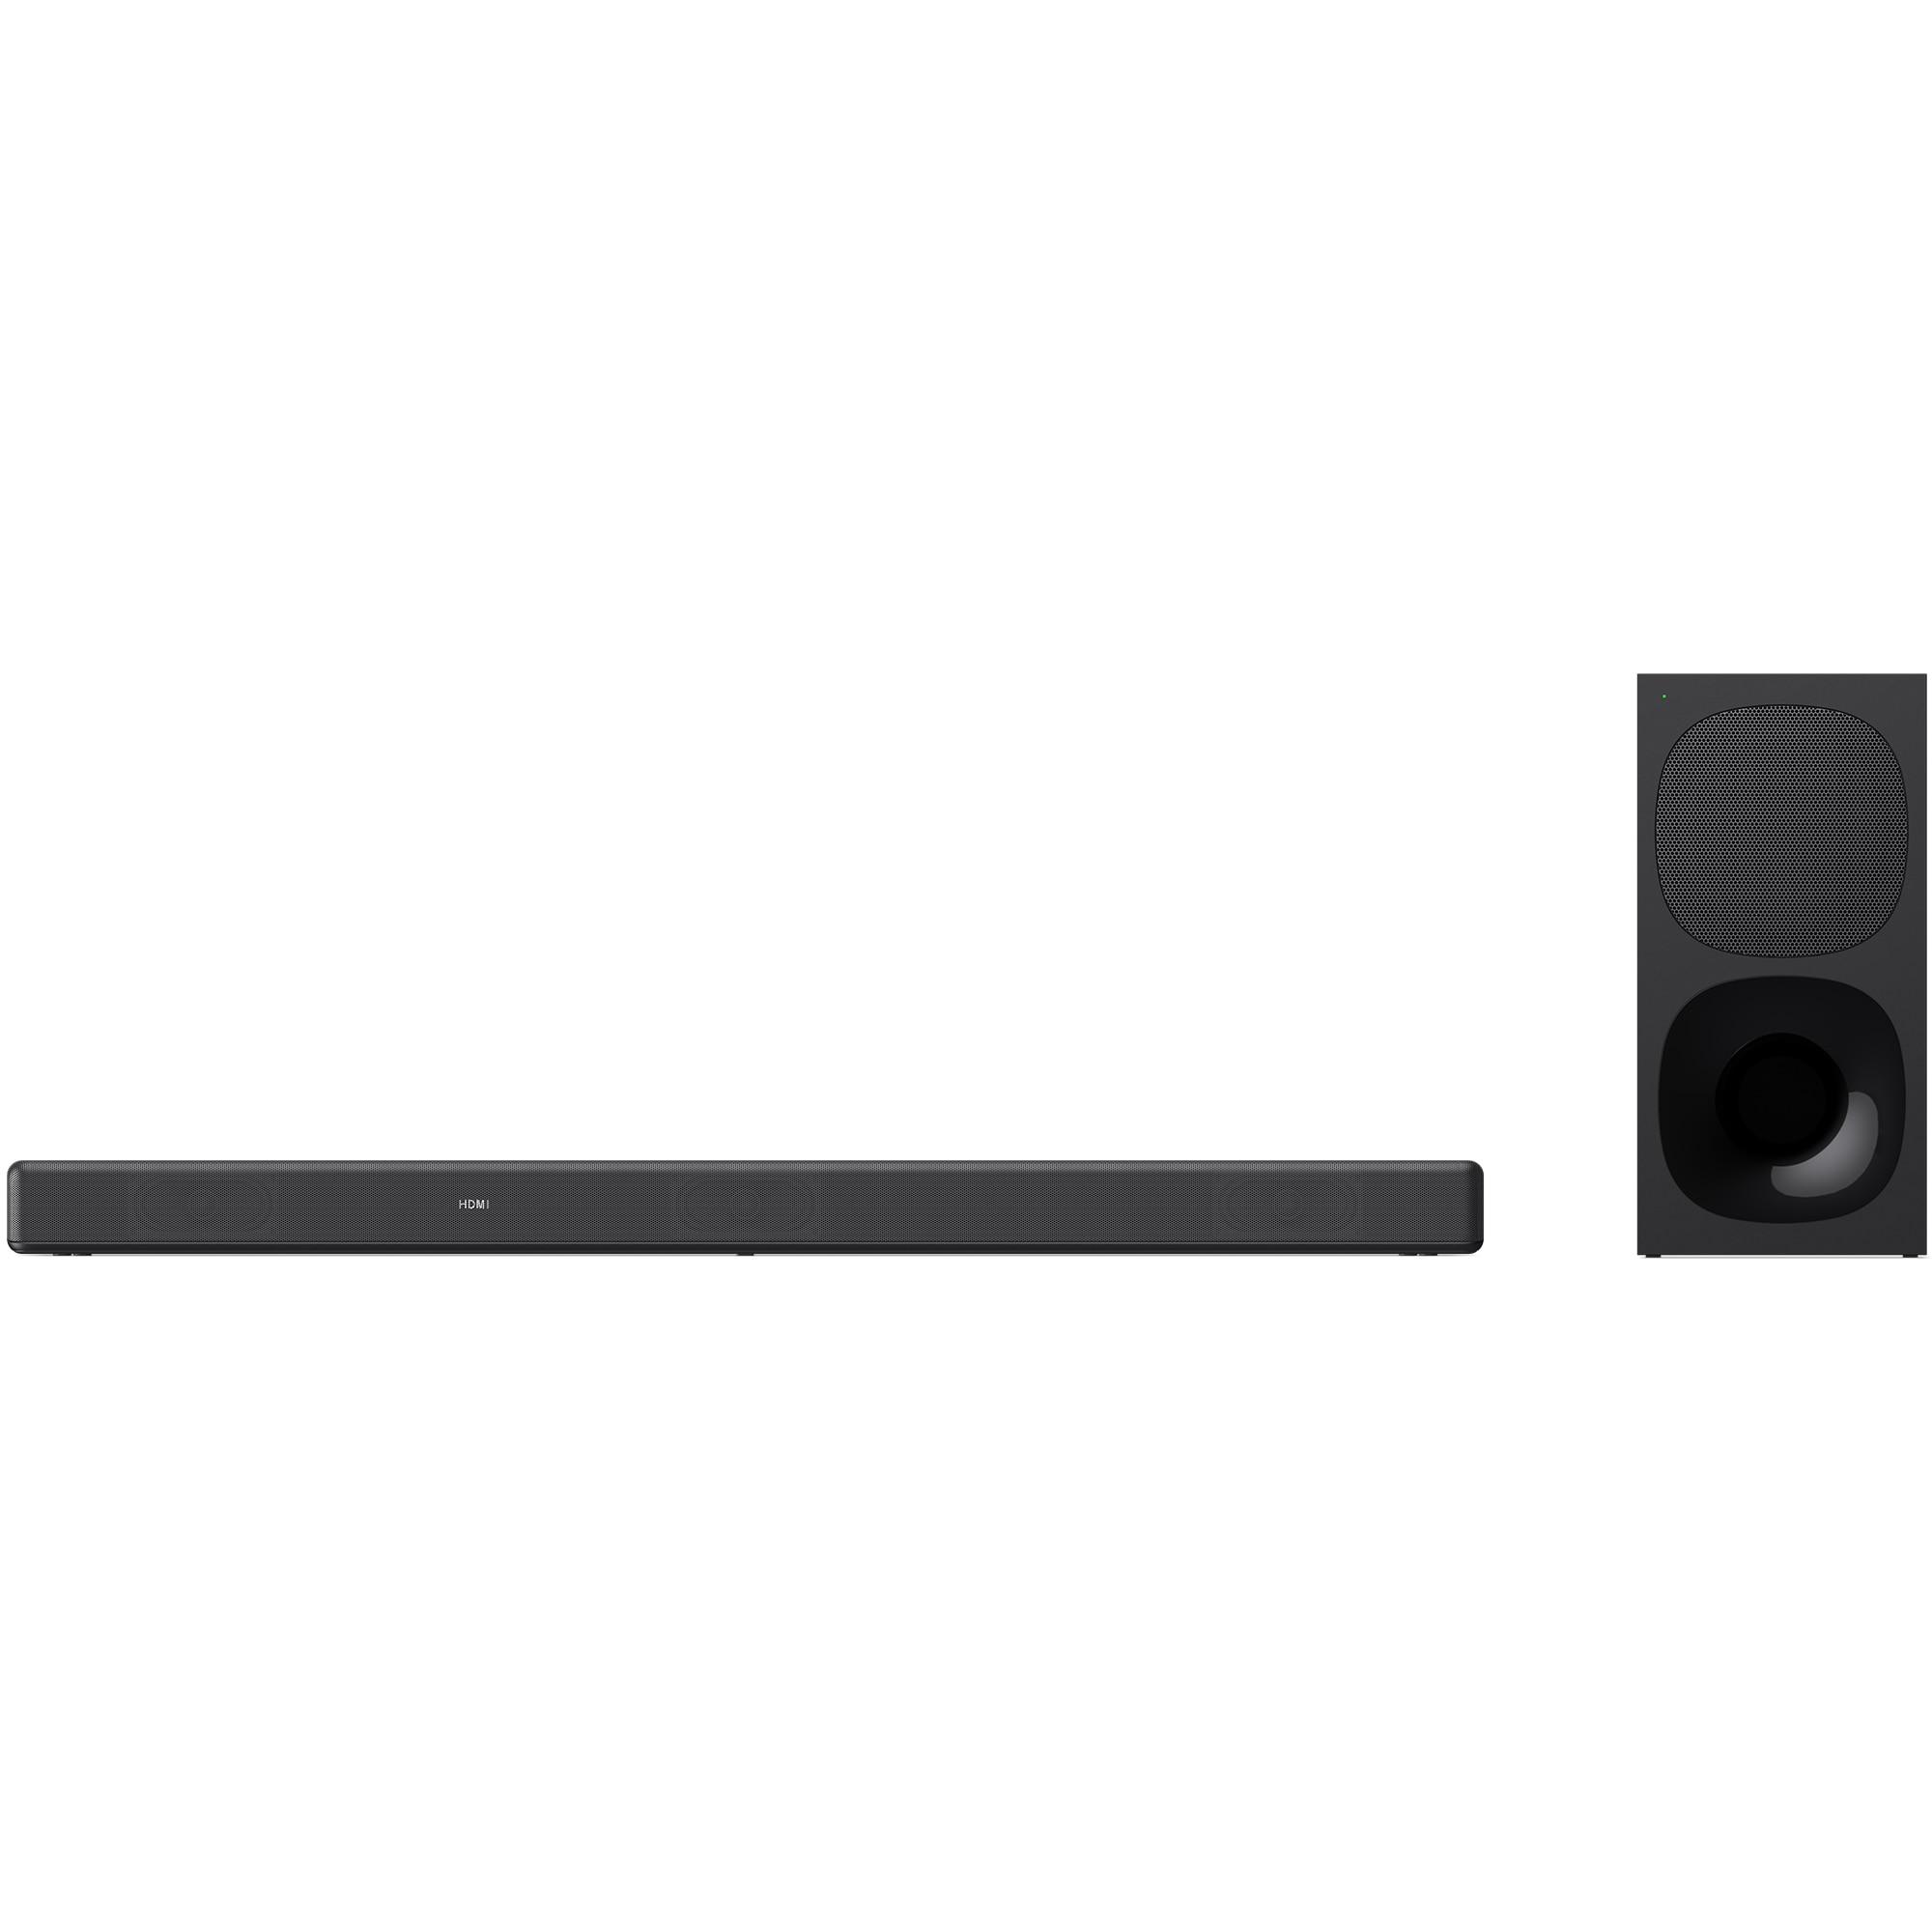 Fotografie Soundbar Sony HT-G700, 3.1, Dolby Atmos, DTS:X, 4K HDR, 400W, Vertical Surround Engine, Subwoofer wireless, Bluetooth, Negru